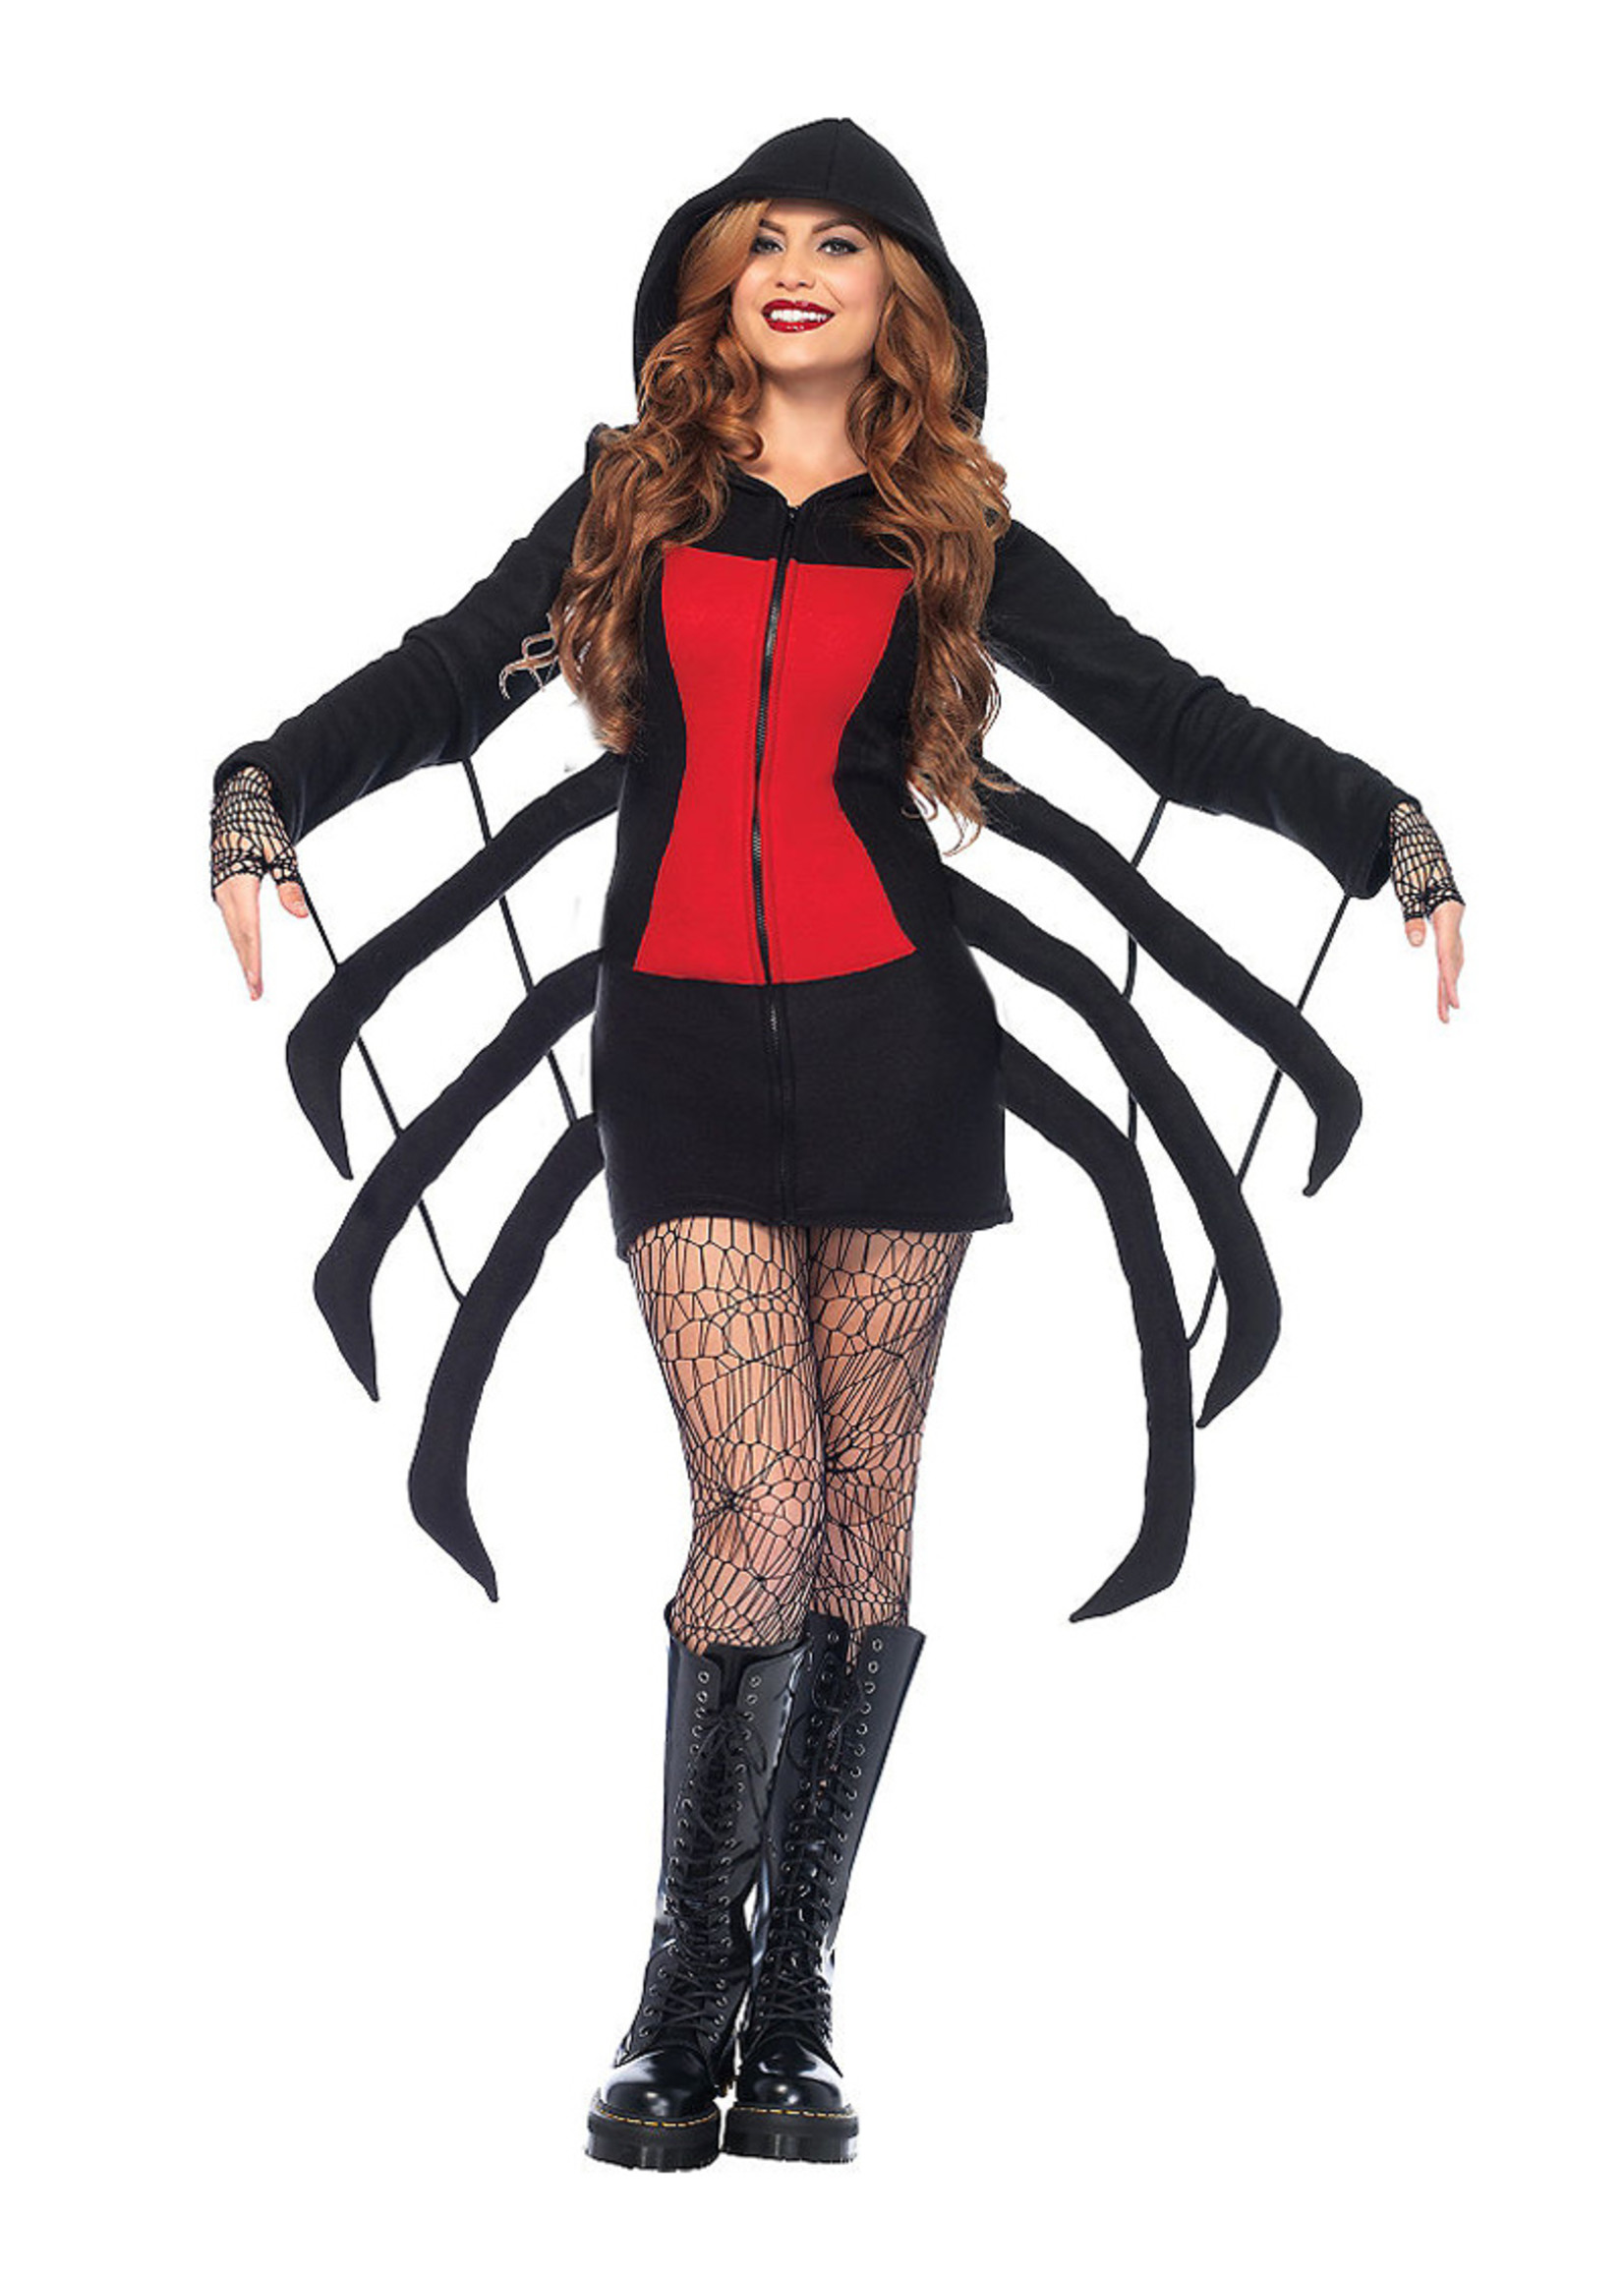 Cozy Black Widow Costume - Women's